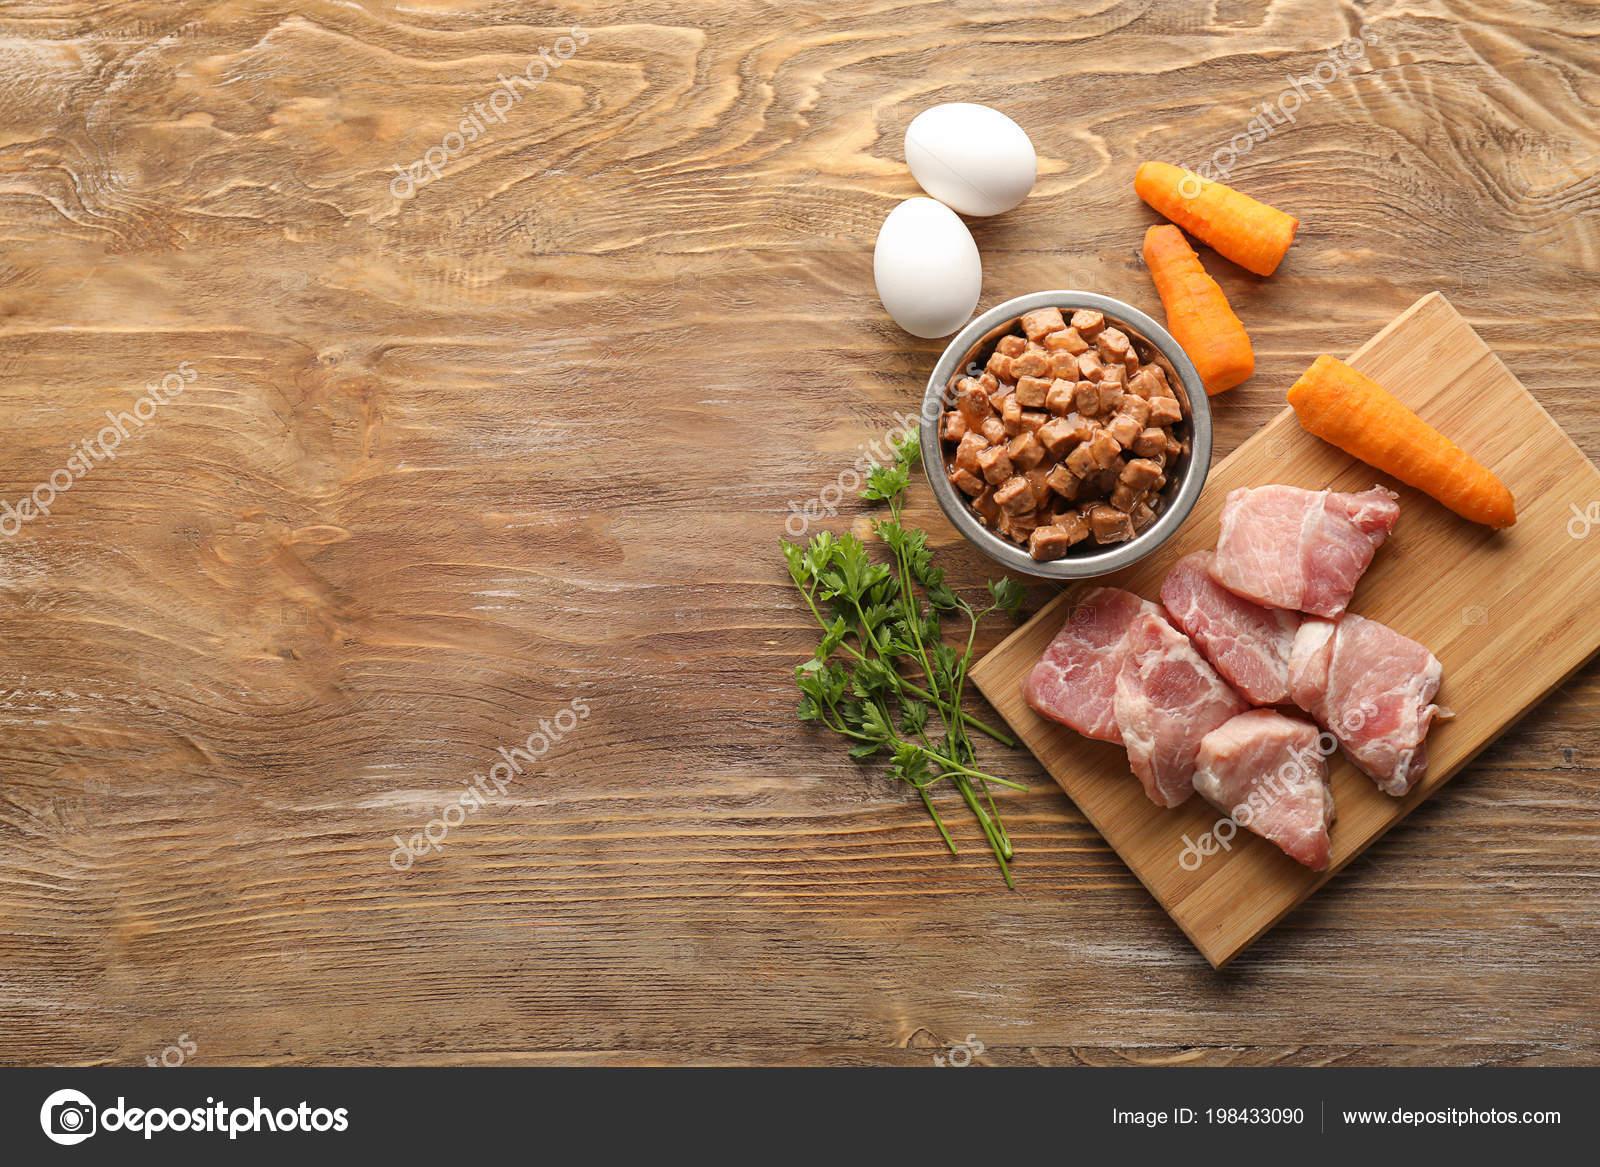 2a4a6744d7ba Σύνθεση Τροφές Ζώων Συντροφιάς Και Διαφορετικά Προϊόντα Φόντο Ξύλινη —  Φωτογραφία Αρχείου